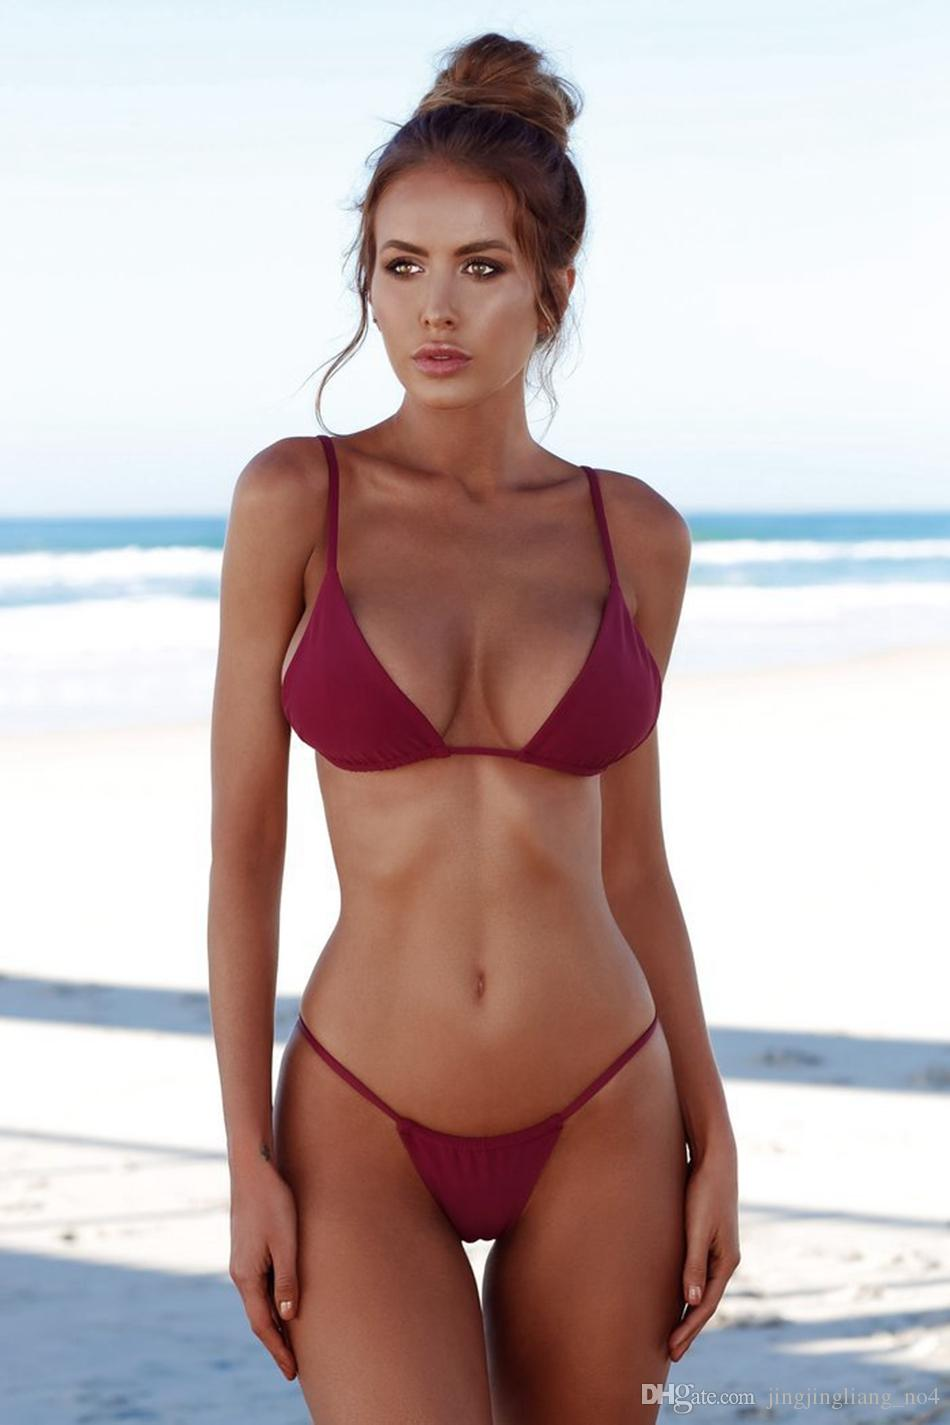 Women Swimwear Set Swimsuit Bikini Push-up Padded Top Bottom Set Padded Bra Swimsuit Swimwear Bathing Suit LJJO4139